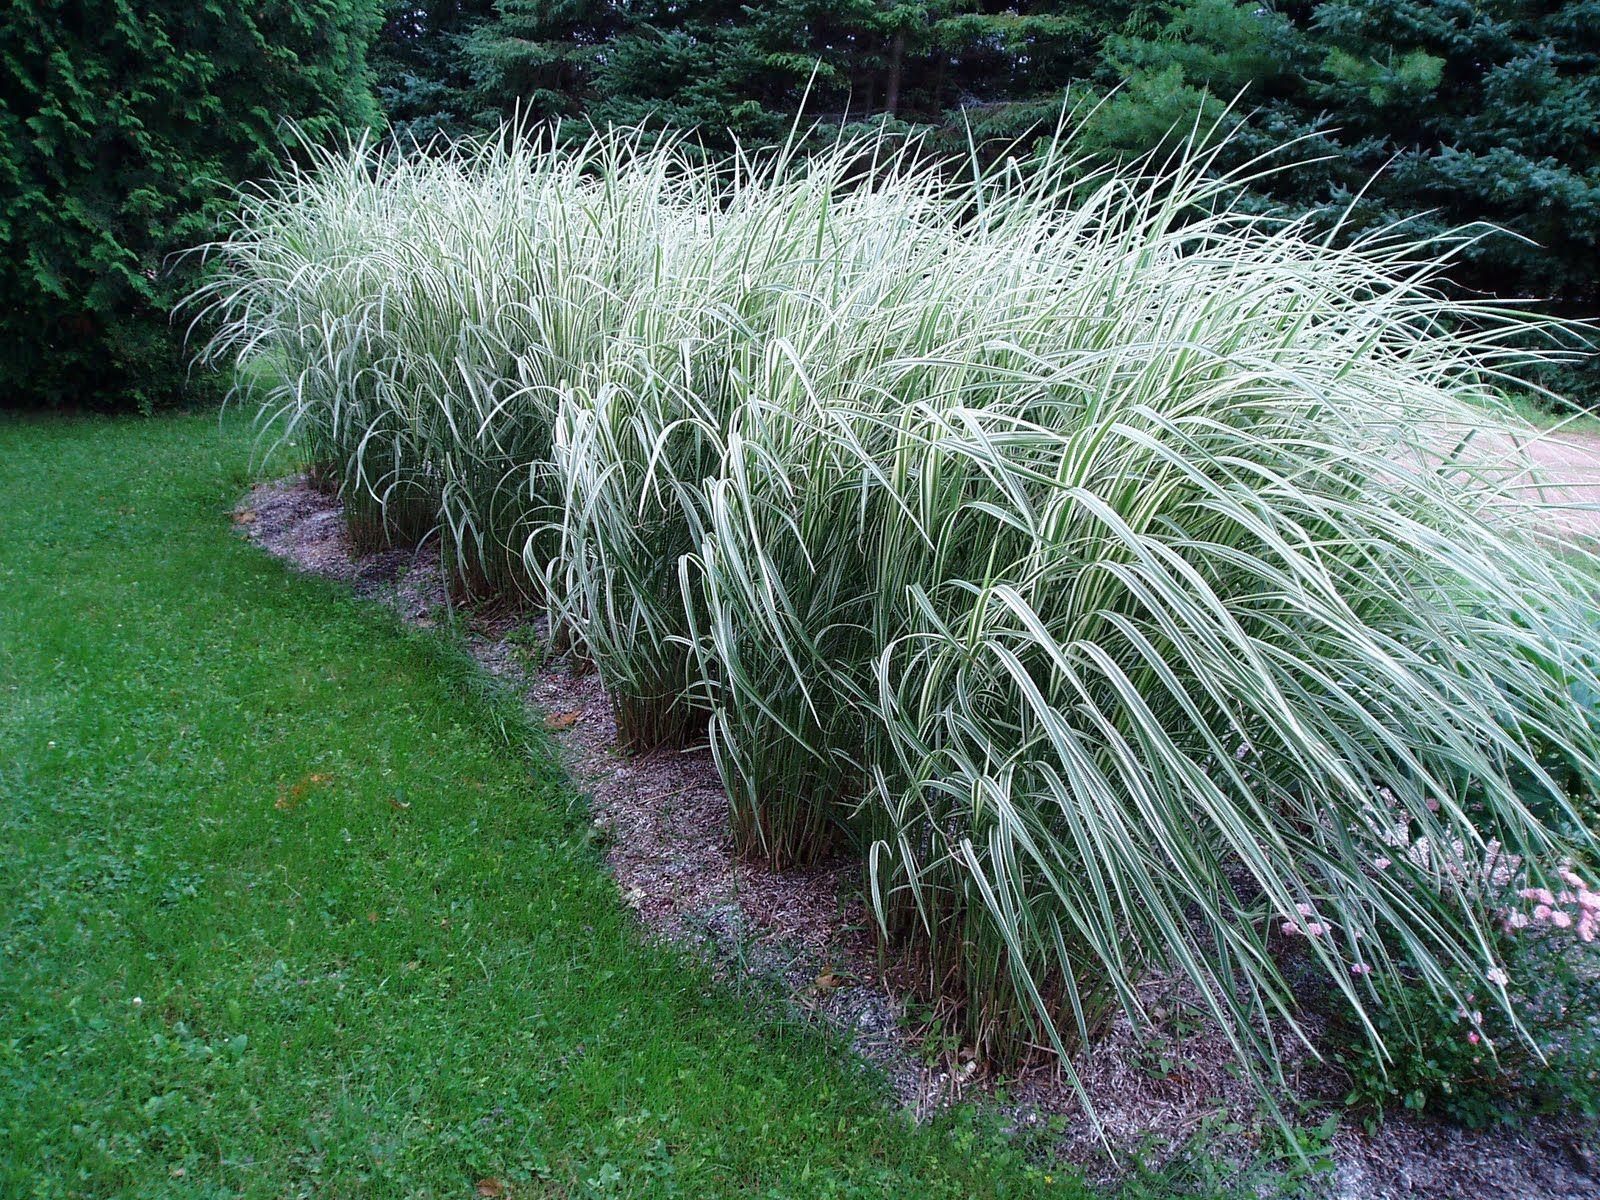 Lovegrass Farm Miscanthus Sinensis Variegatus Tall Ornamental Grasses Ornamental Grasses Grasses Landscaping